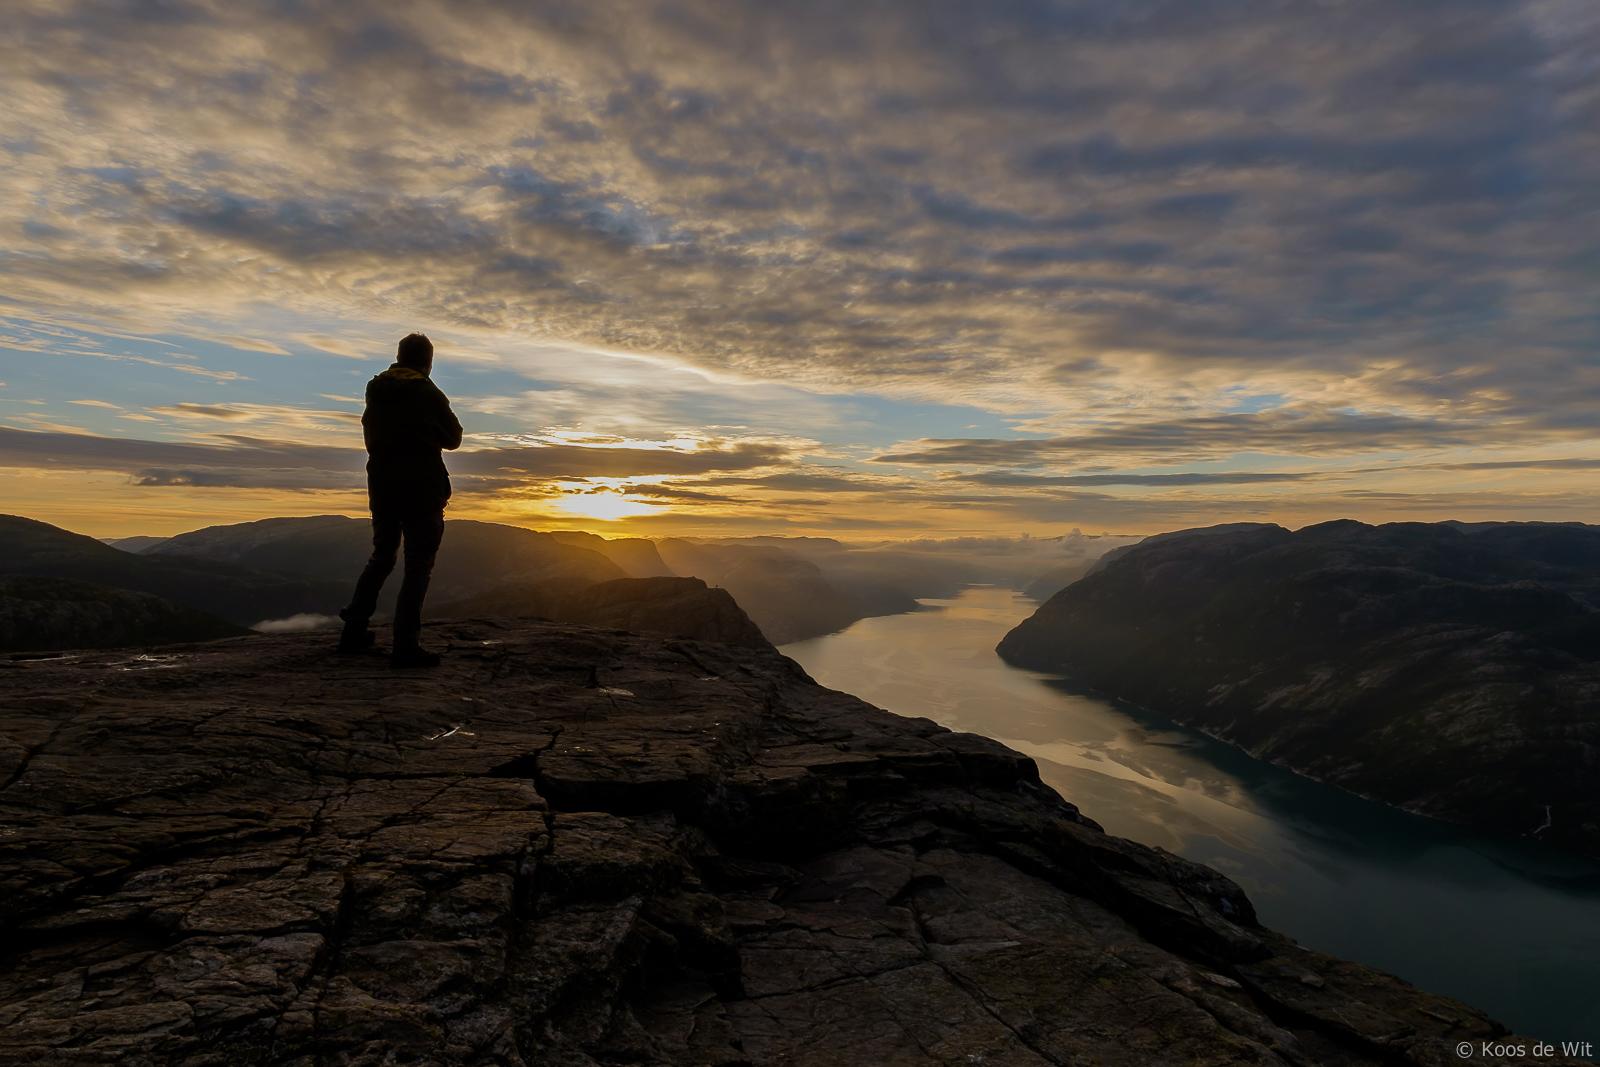 Me watching the sunrise on the Preikestolen, Norway